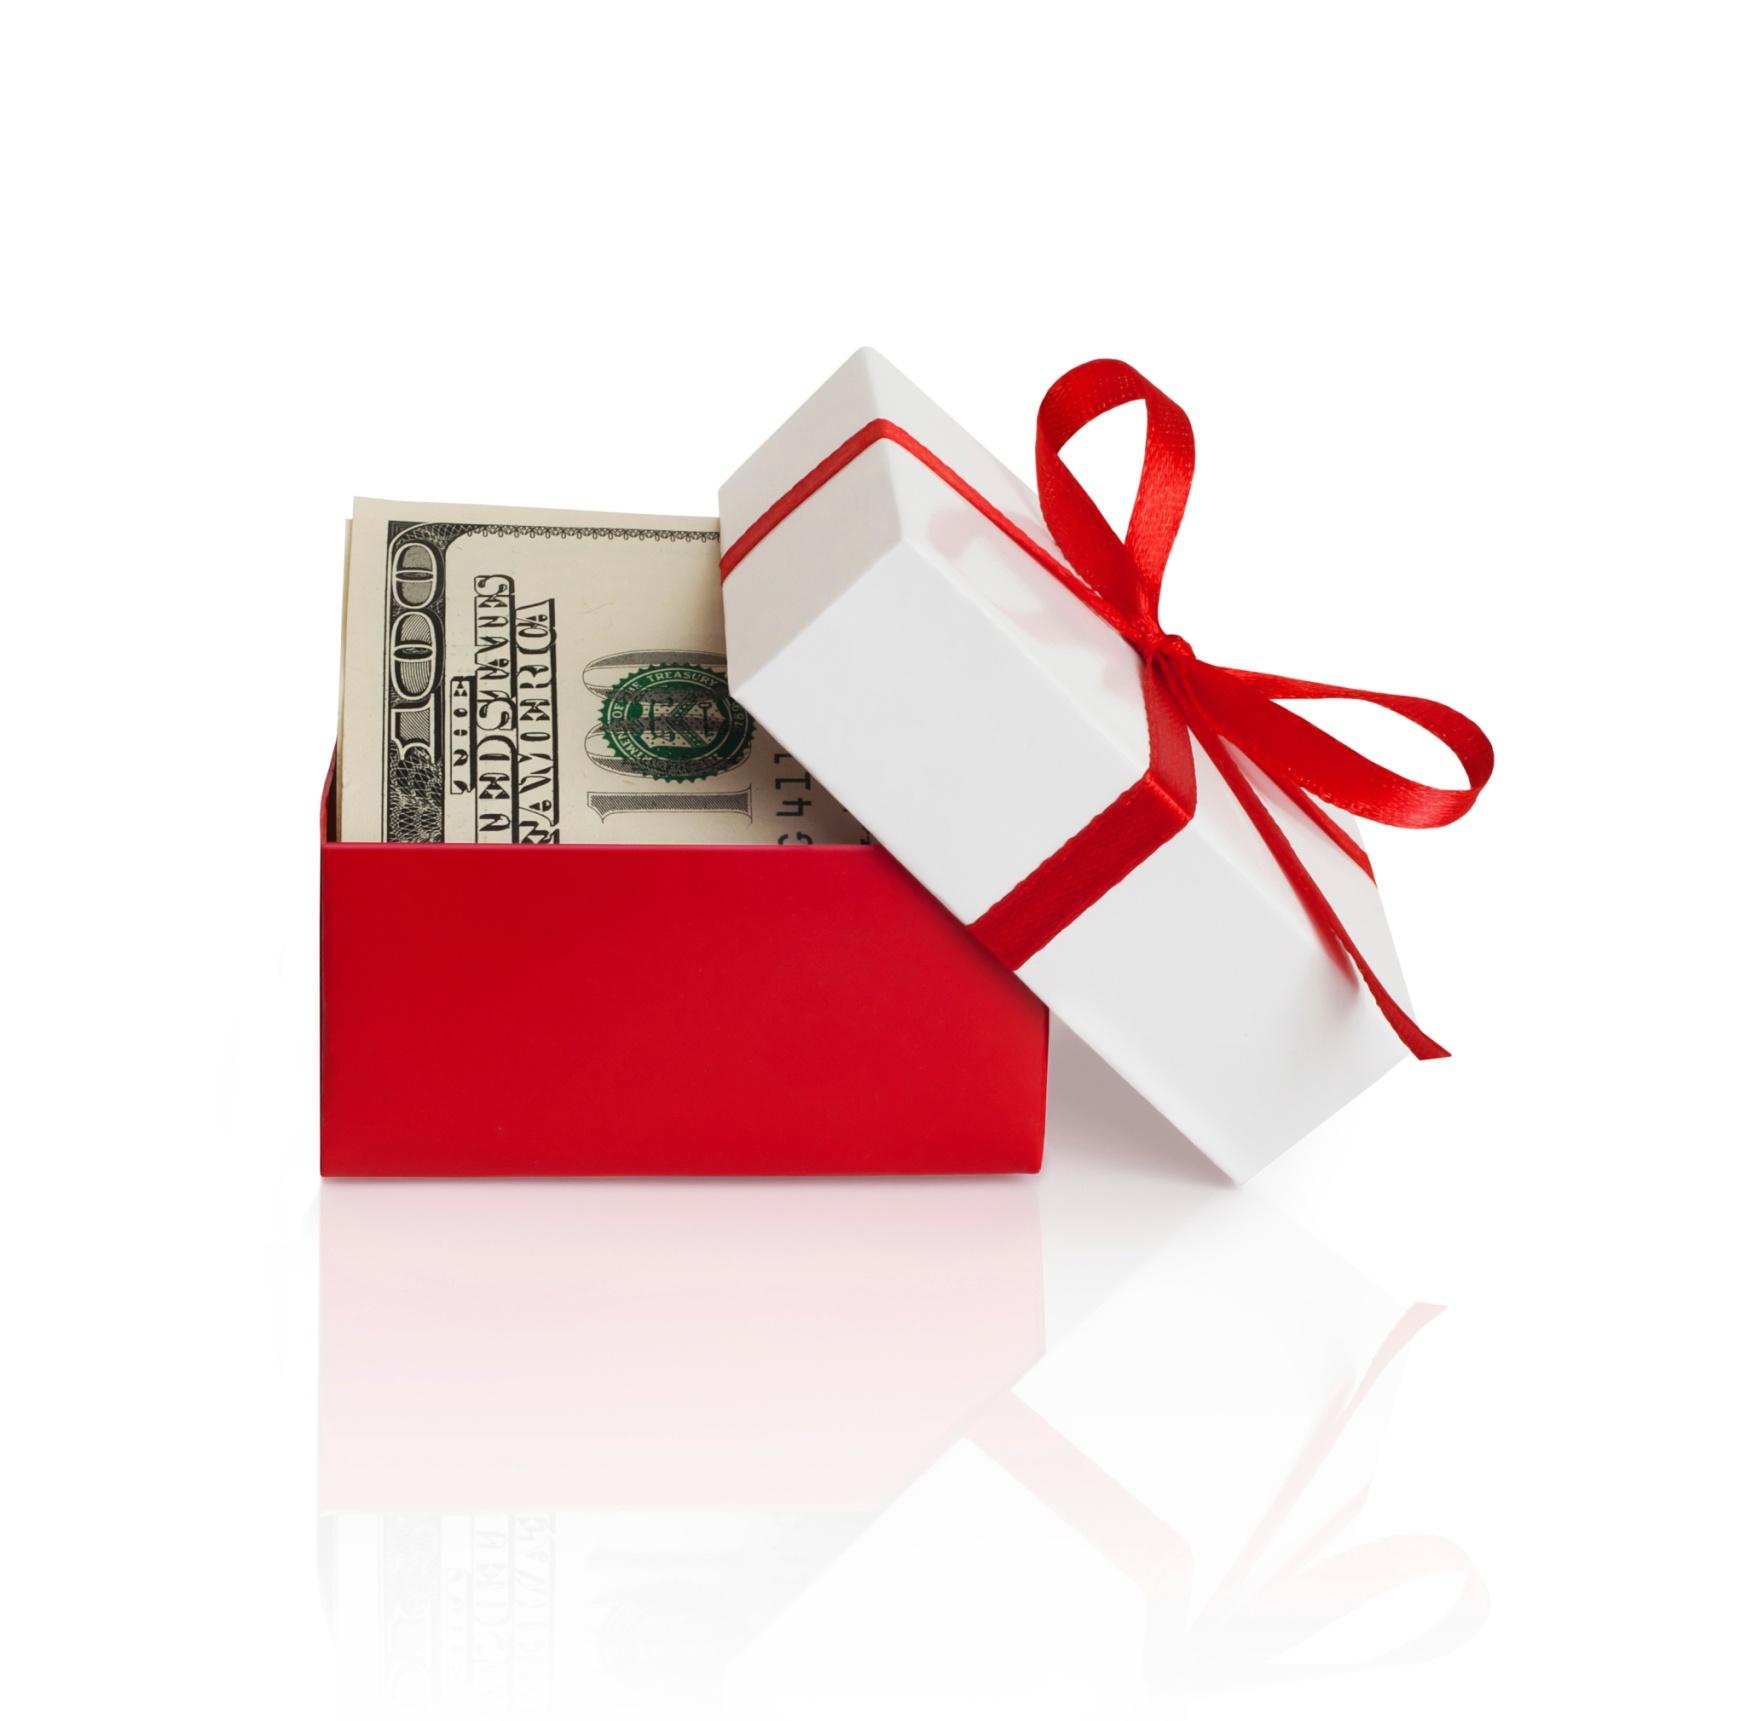 money_gift_ThinkstockPhotos-179330649.jpg